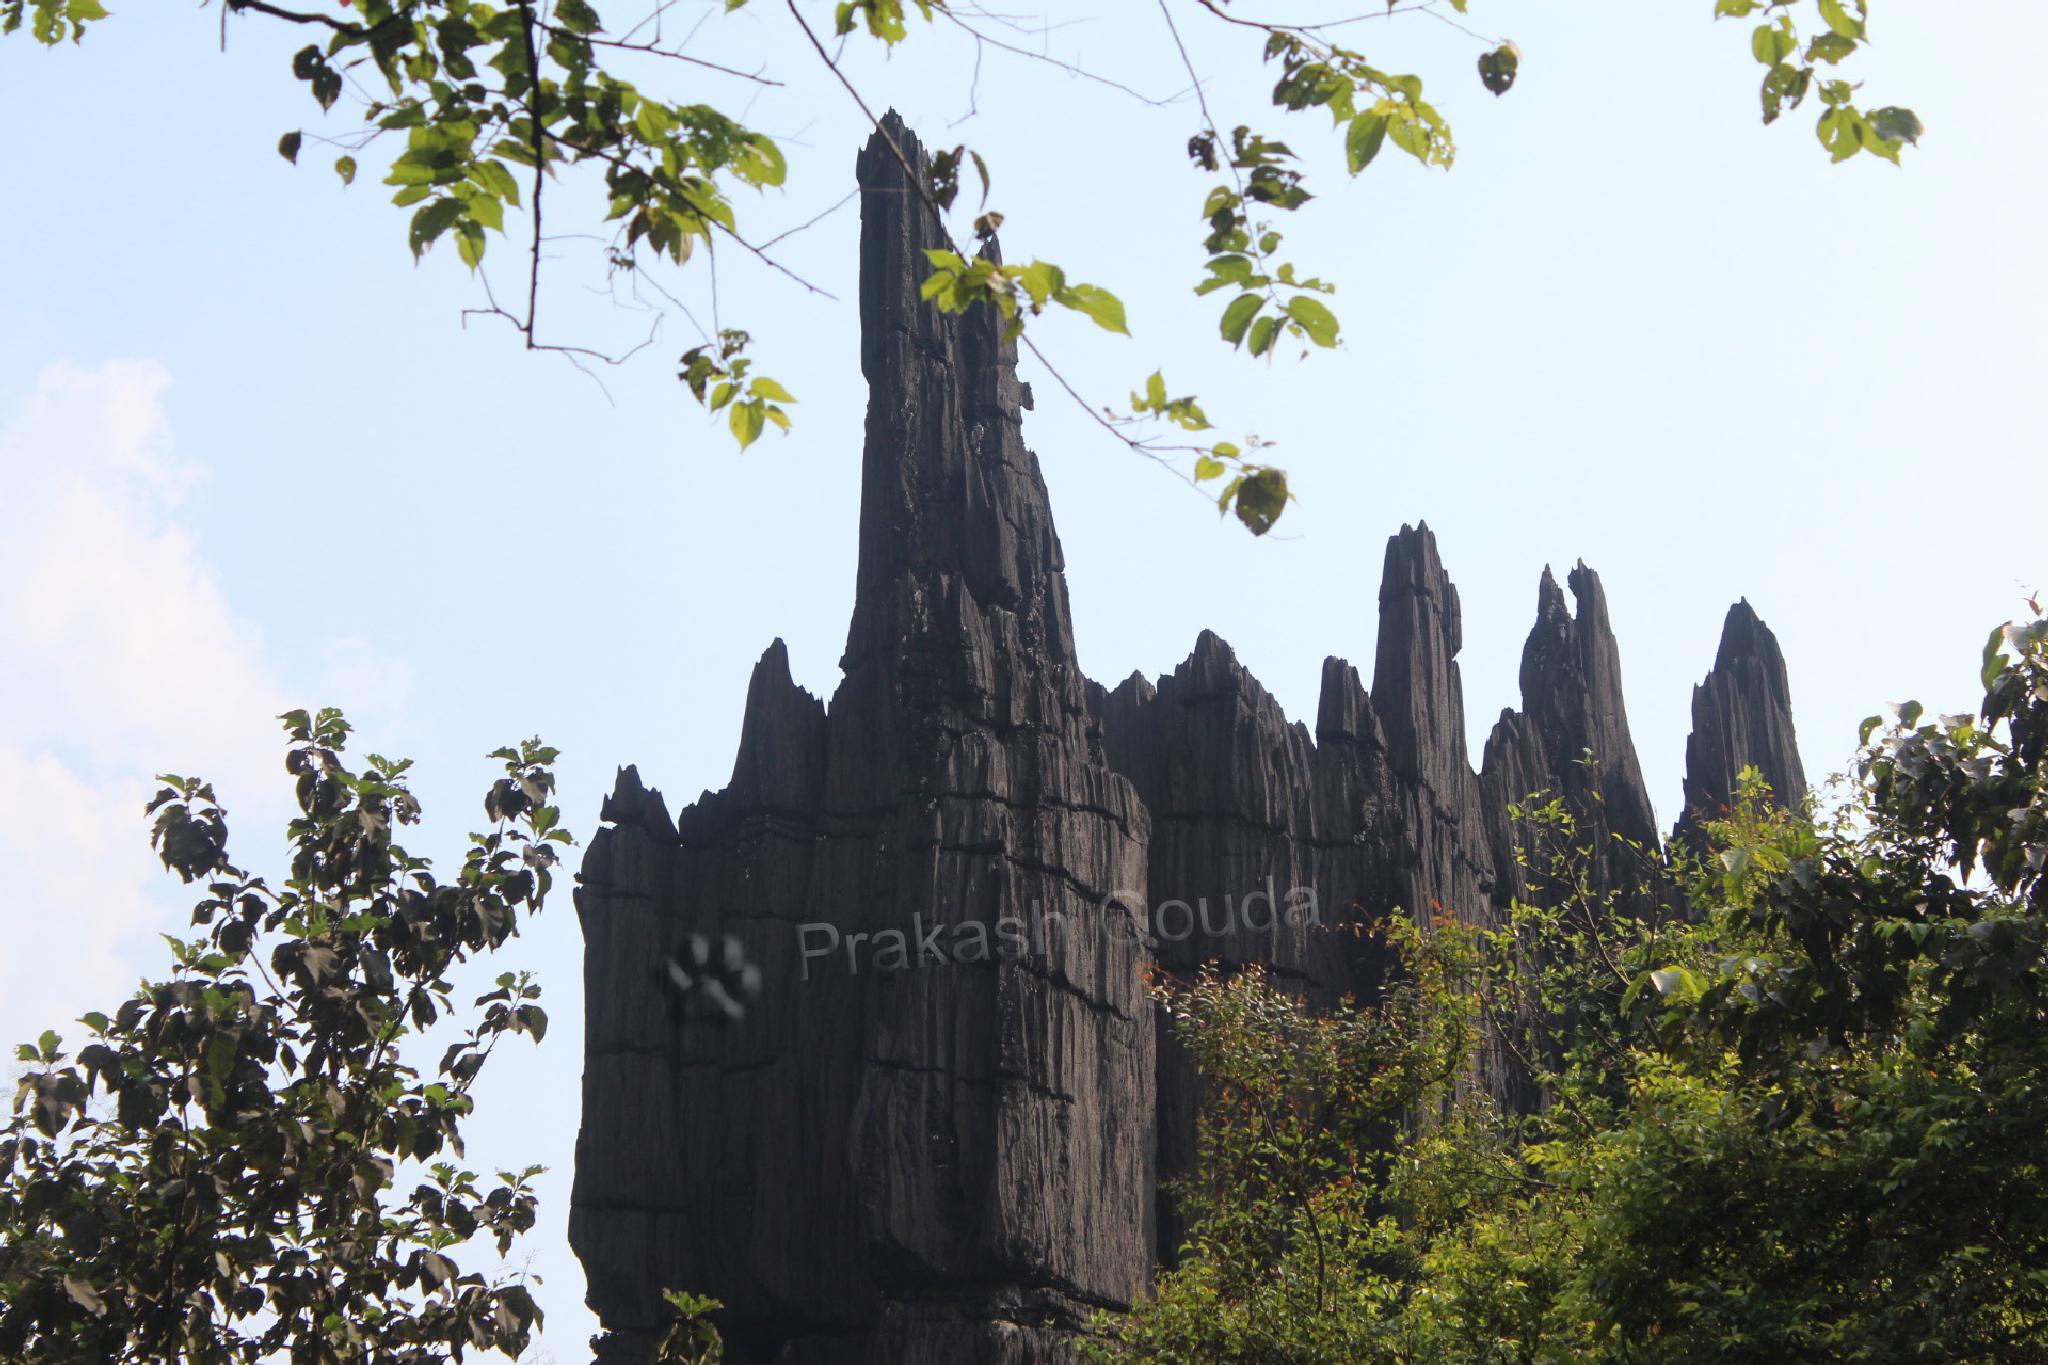 Lime Stone Hill, Look Like Churches (Mohini shikara) · Yana by PrakashGouda